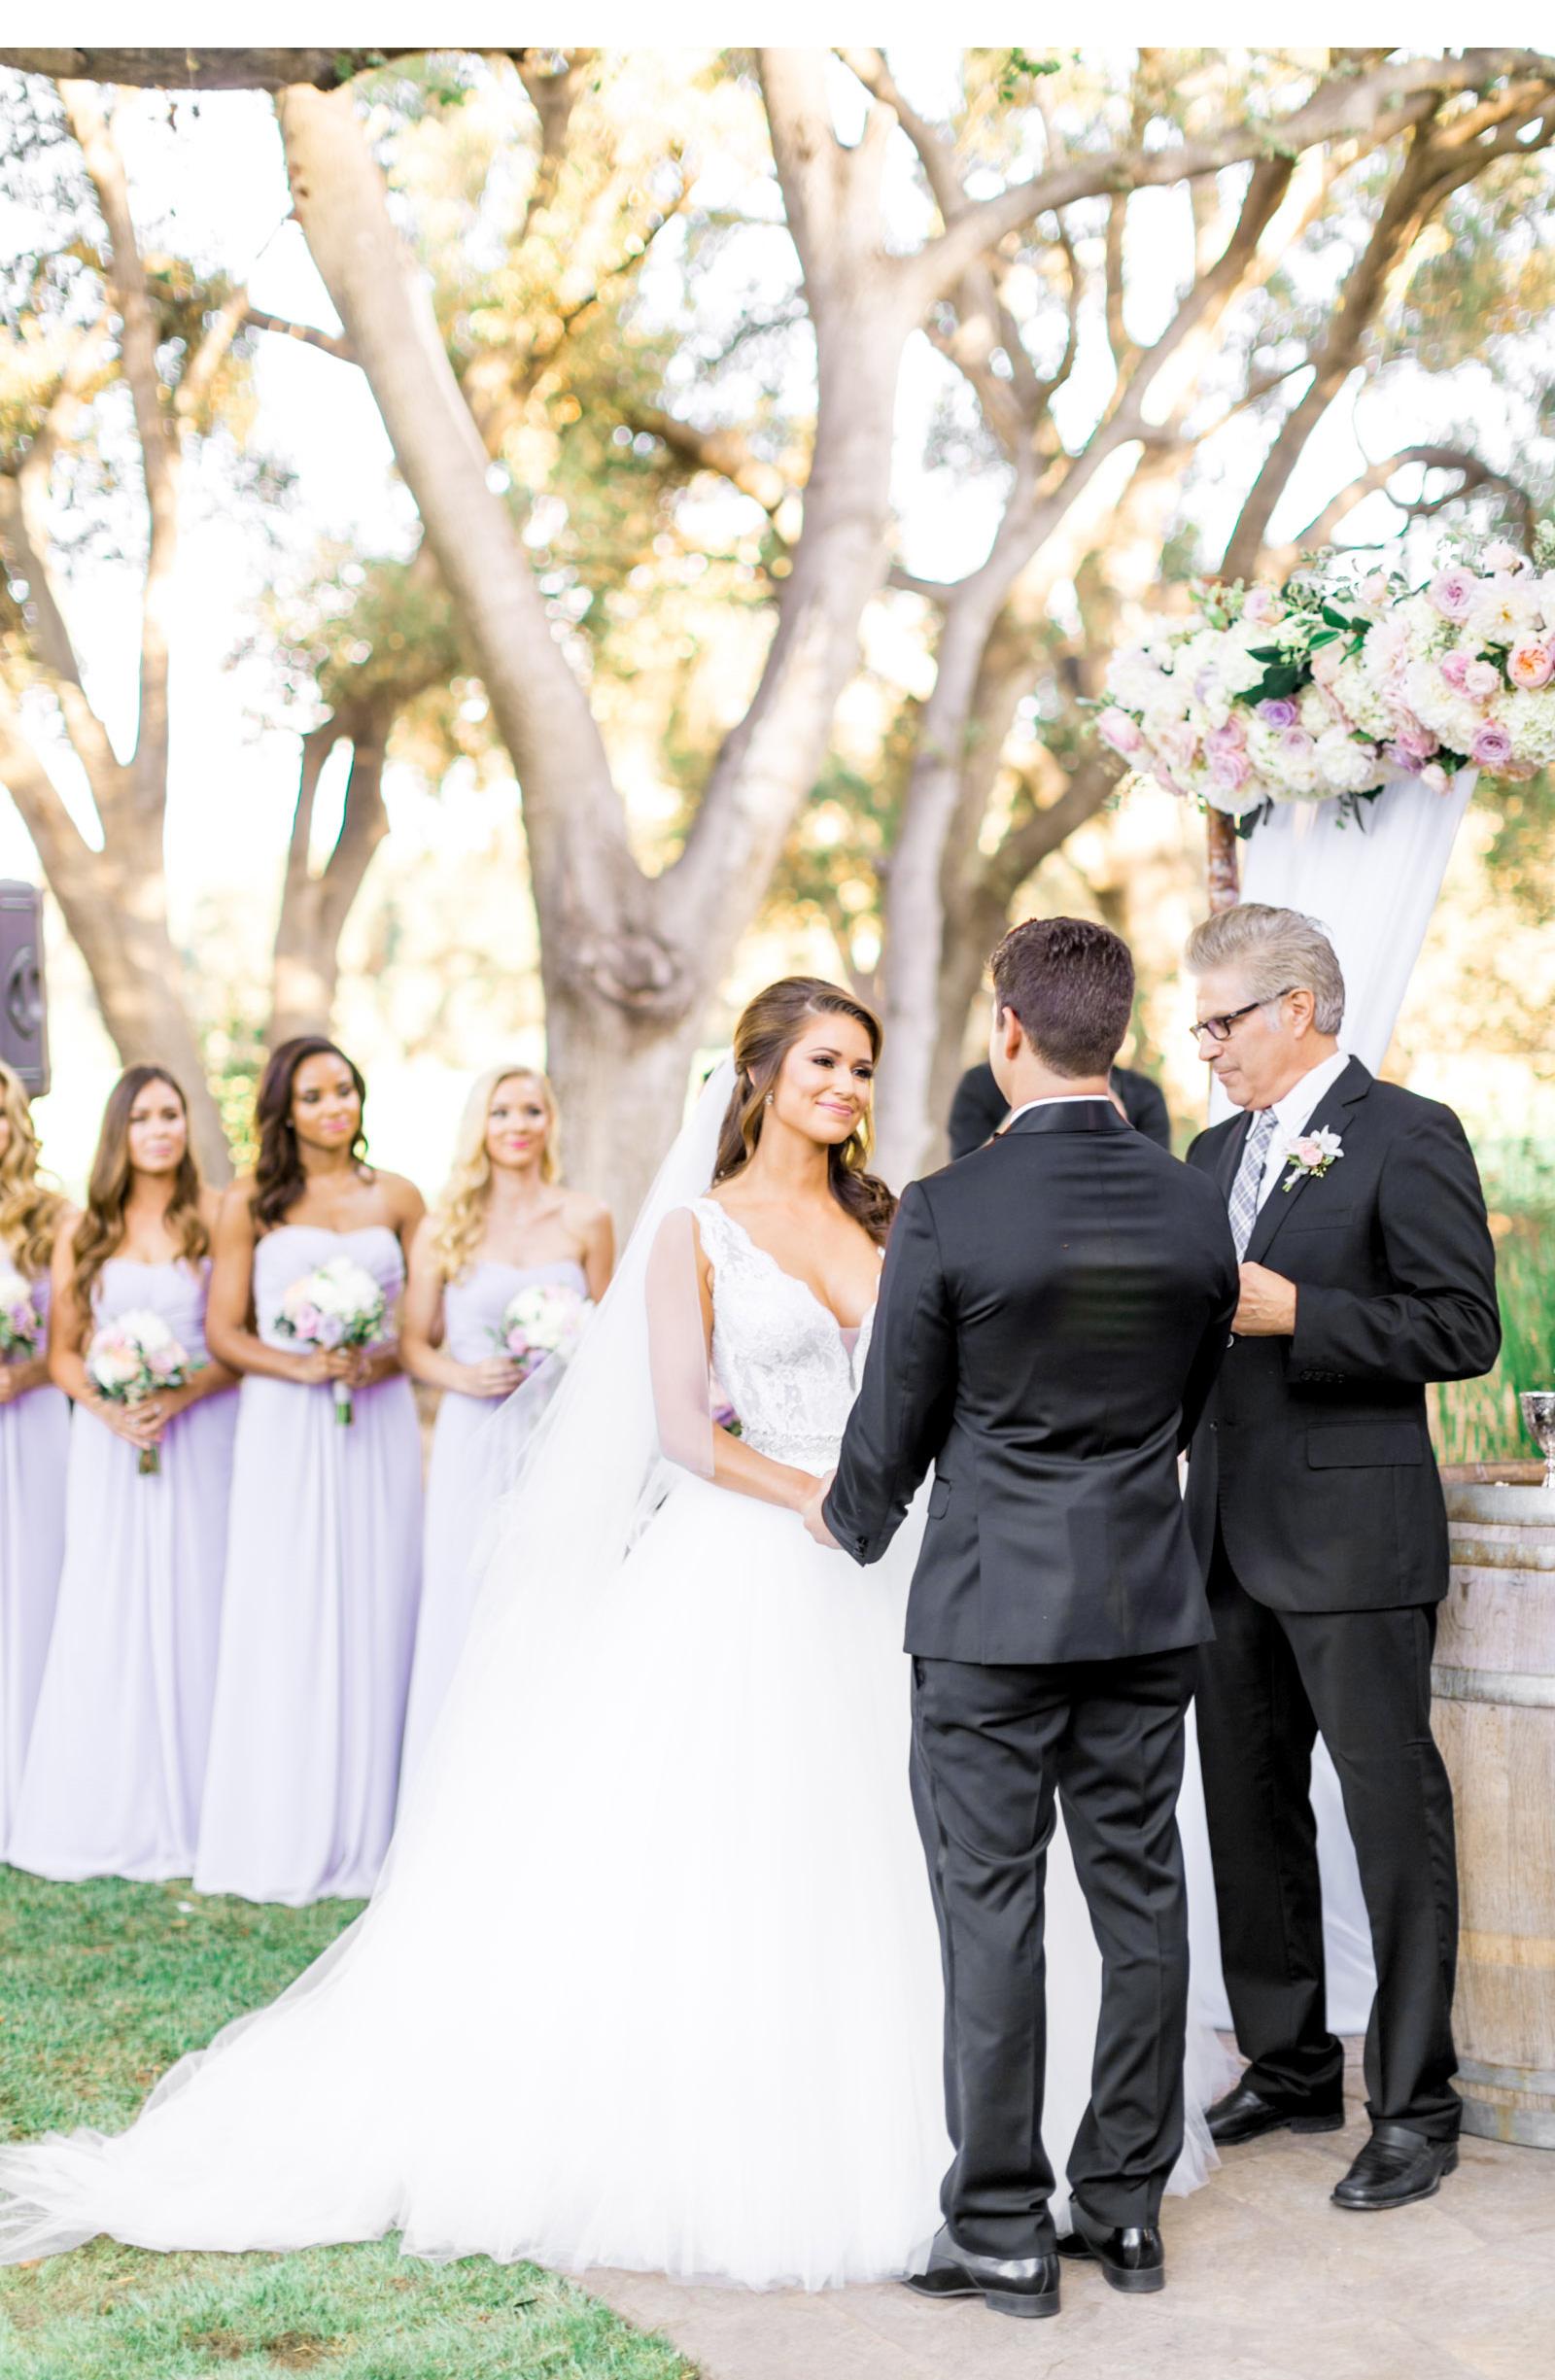 Miss-USA-Wedding-Ceremony-Natalie-Schutt-Photography_02.jpg